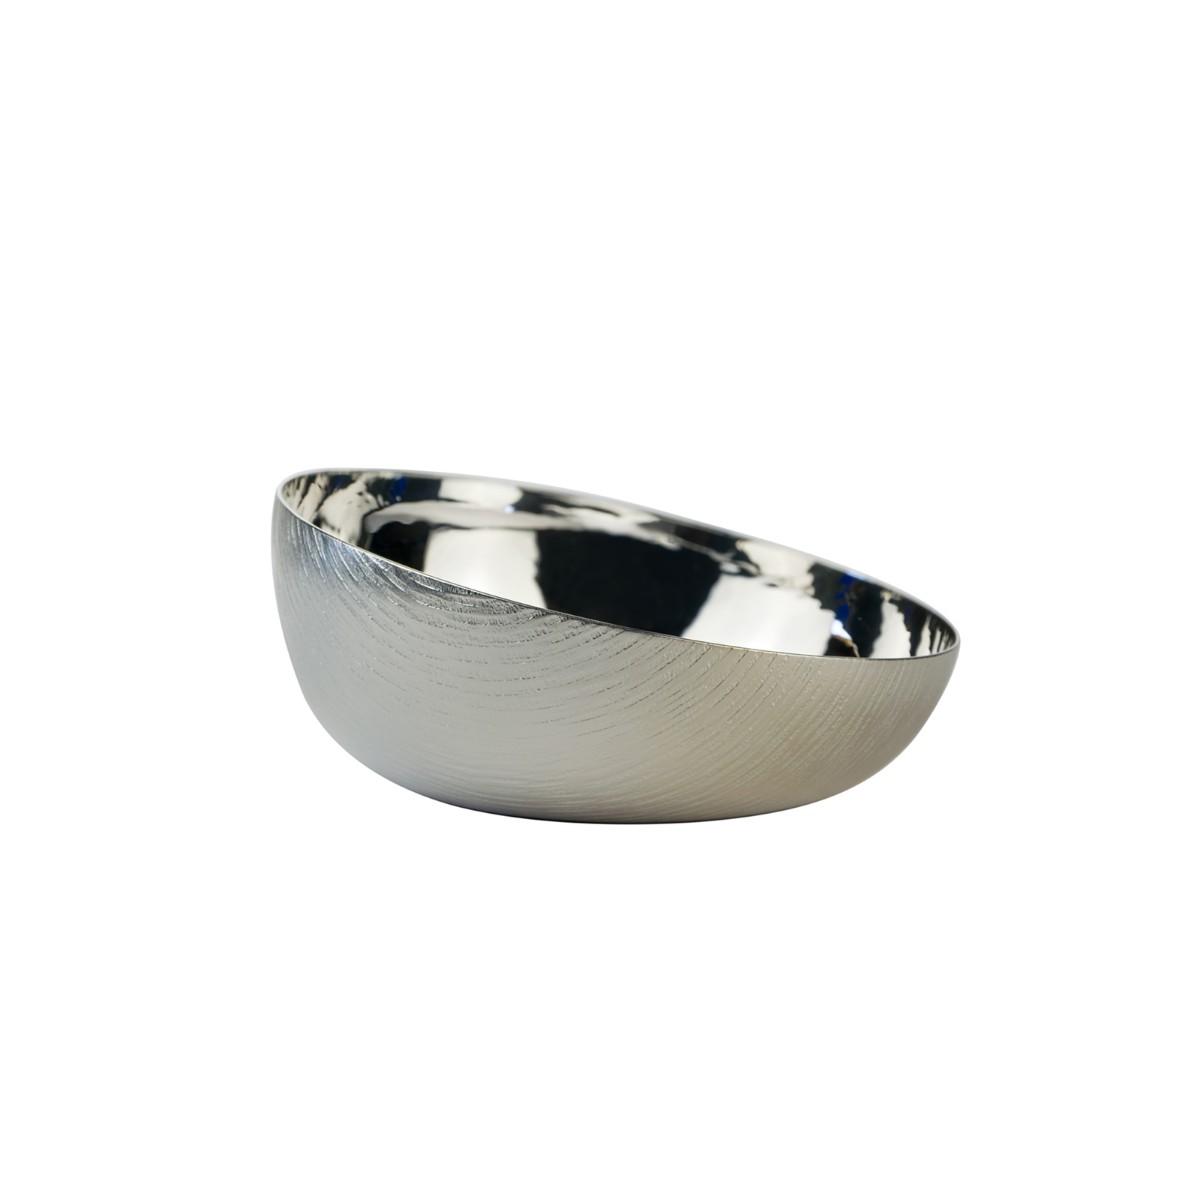 Zanetto I Bombai Round Bowl